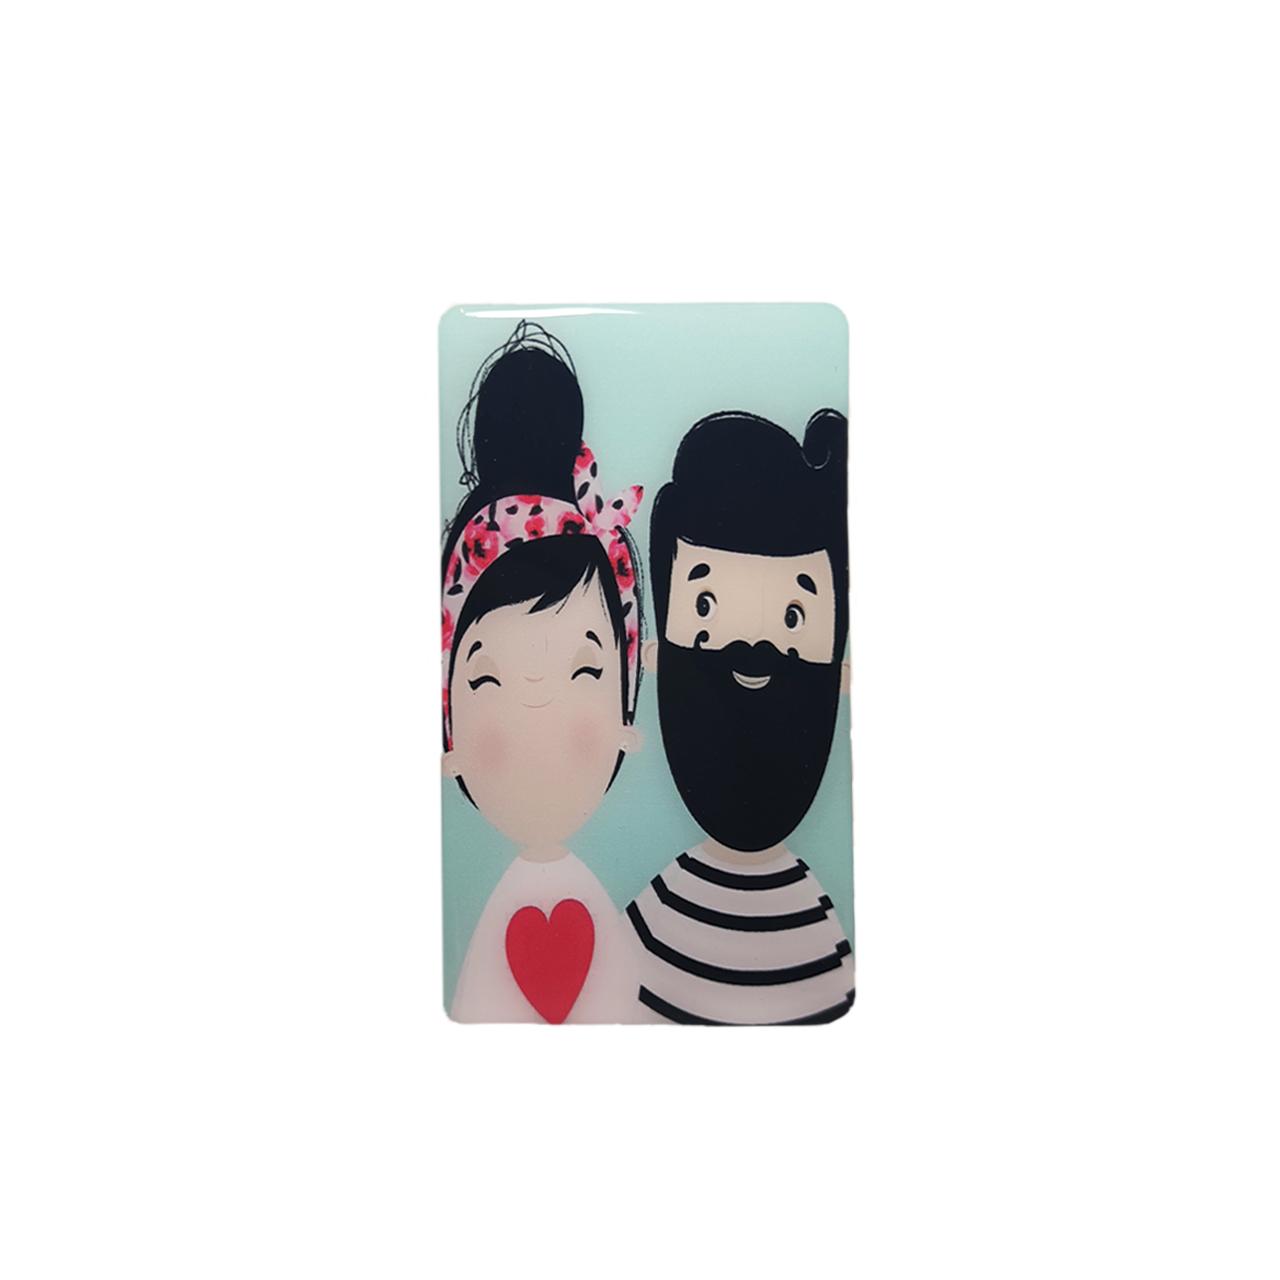 استیکر تزئینی موبایل طرح Boy & Girl کد 1